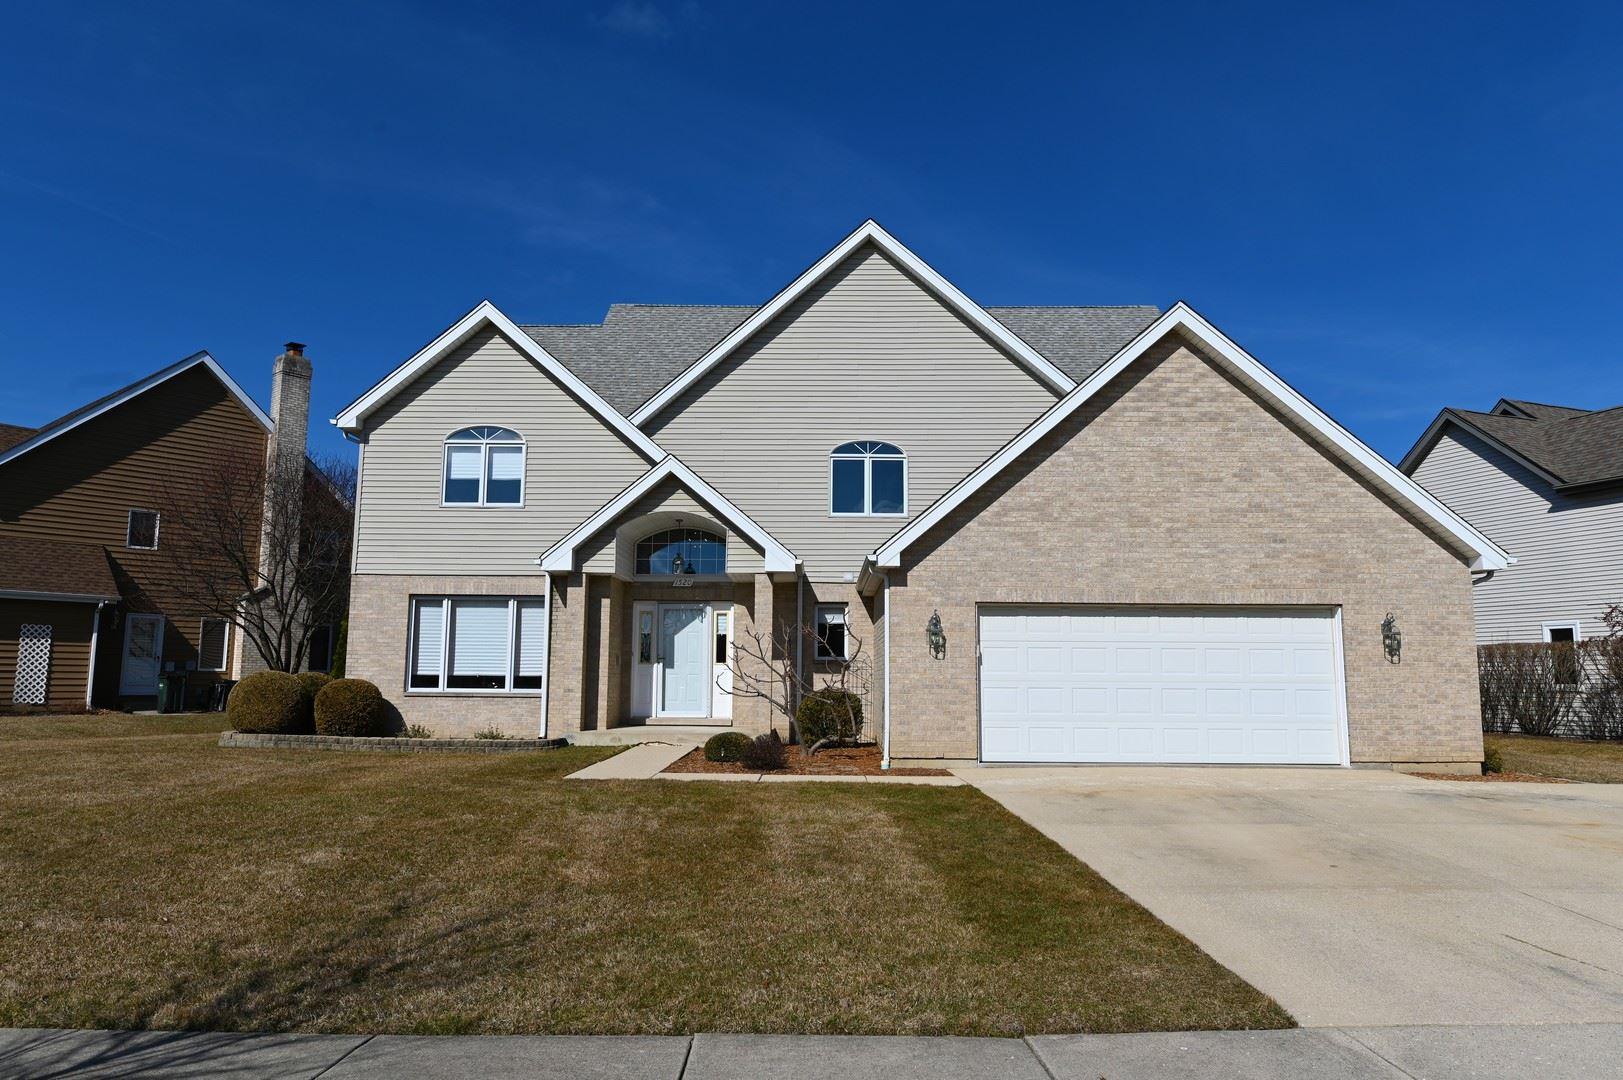 1520 Creekside Drive, Hoffman Estates, IL 60194 - #: 10697281